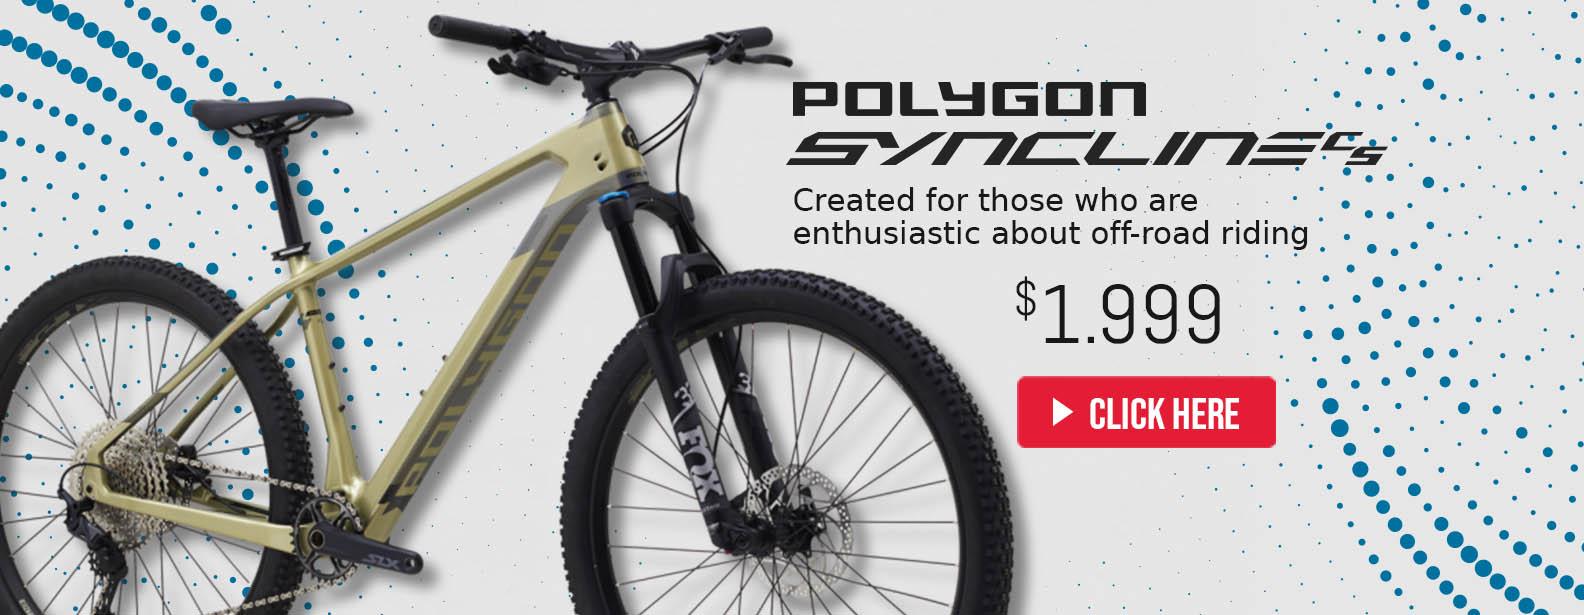 Polygon Syncline C5 Bikes